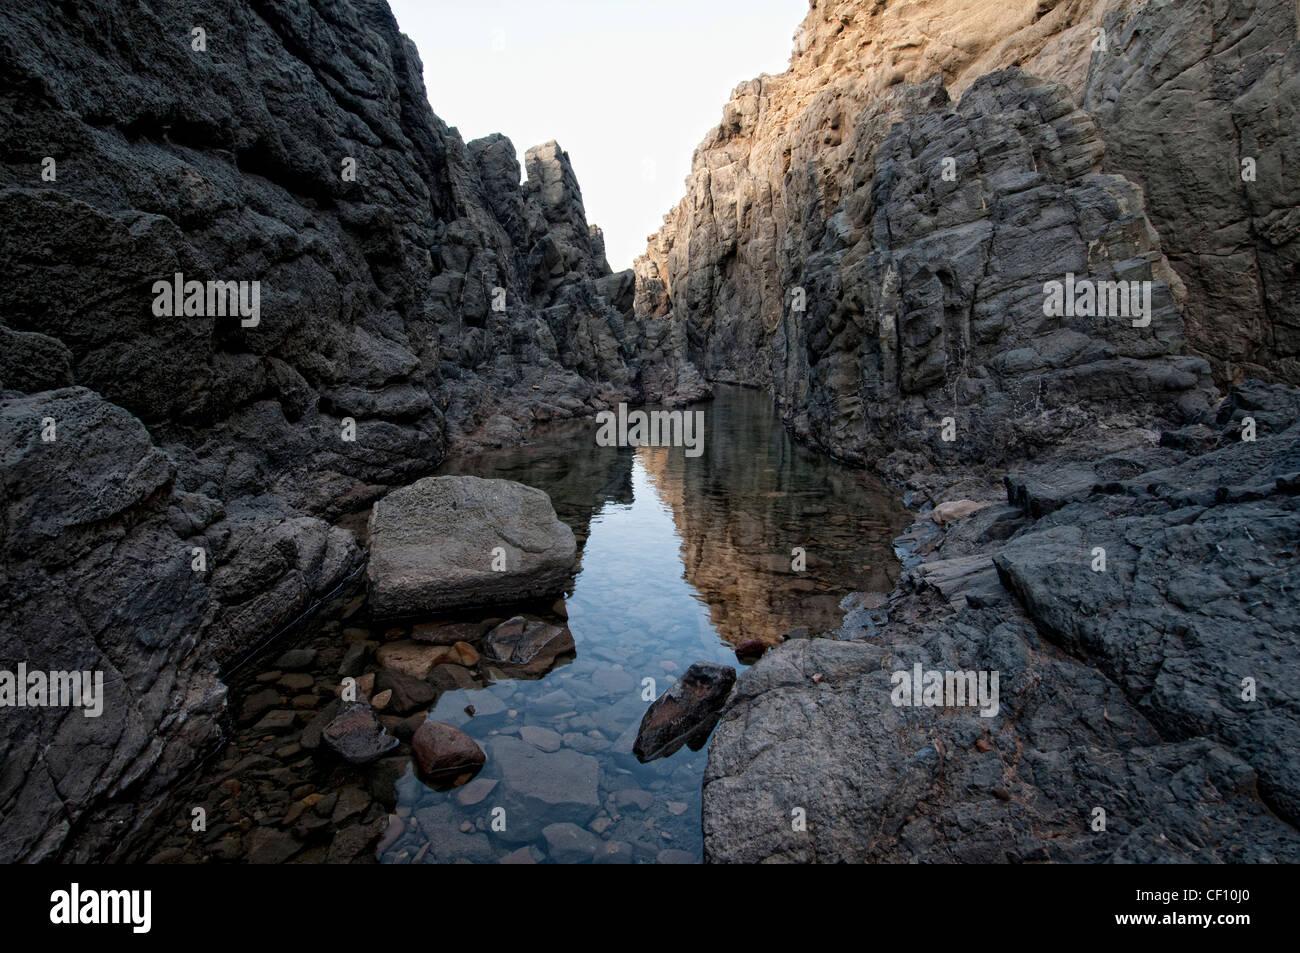 volcanic rocks Fuerteventura - Stock Image